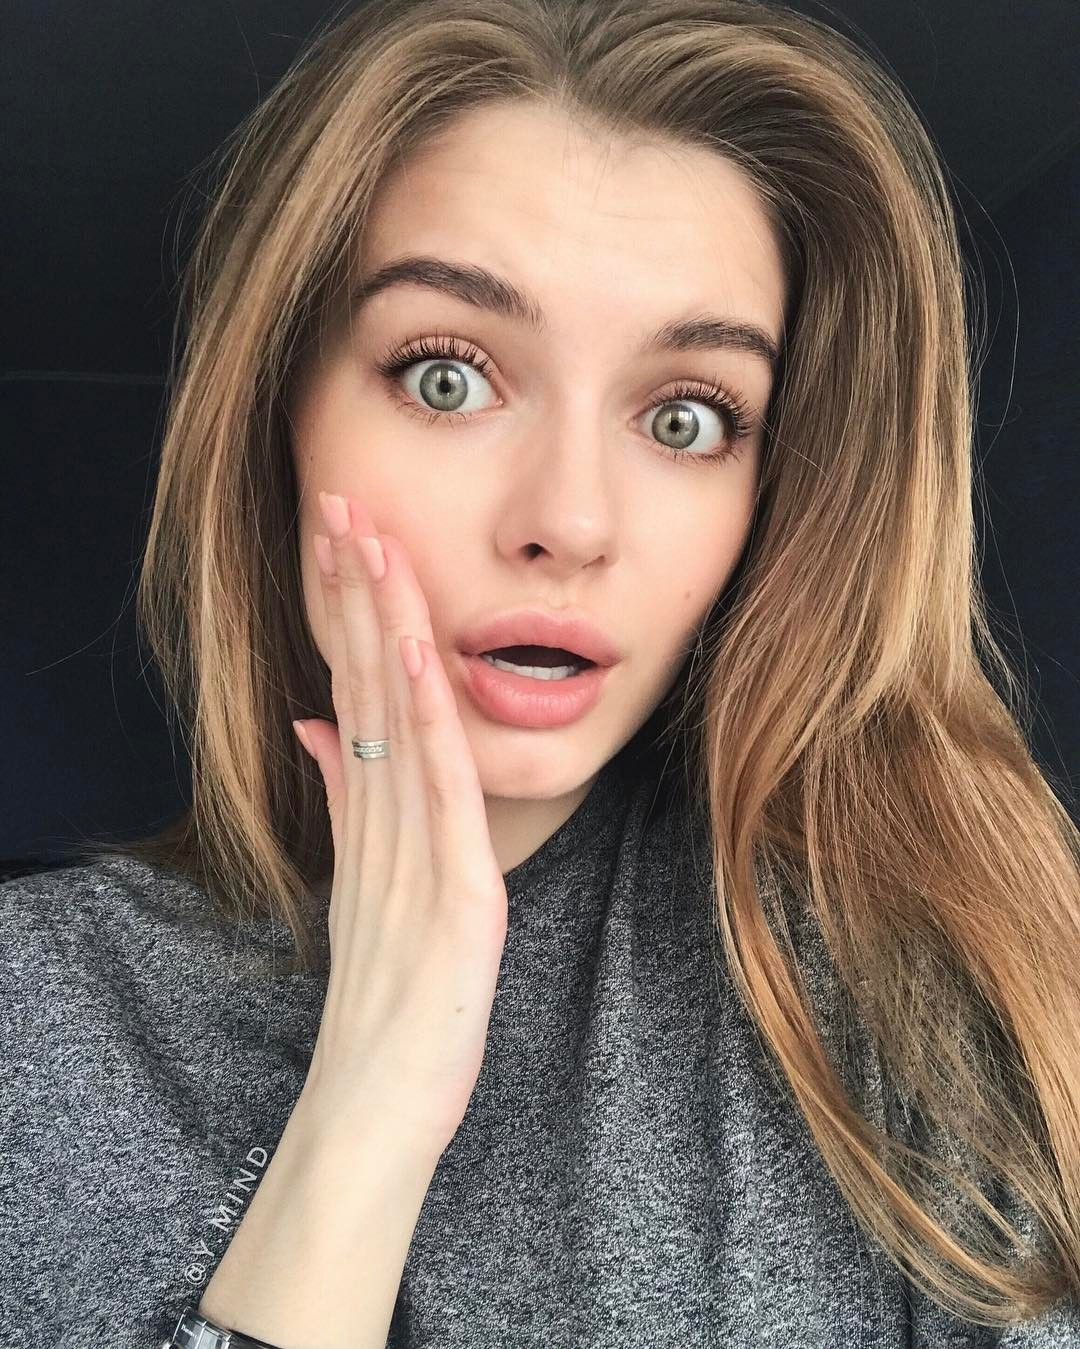 Selfie Snezhana Yanchenko nudes (28 foto and video), Topless, Bikini, Selfie, bra 2018